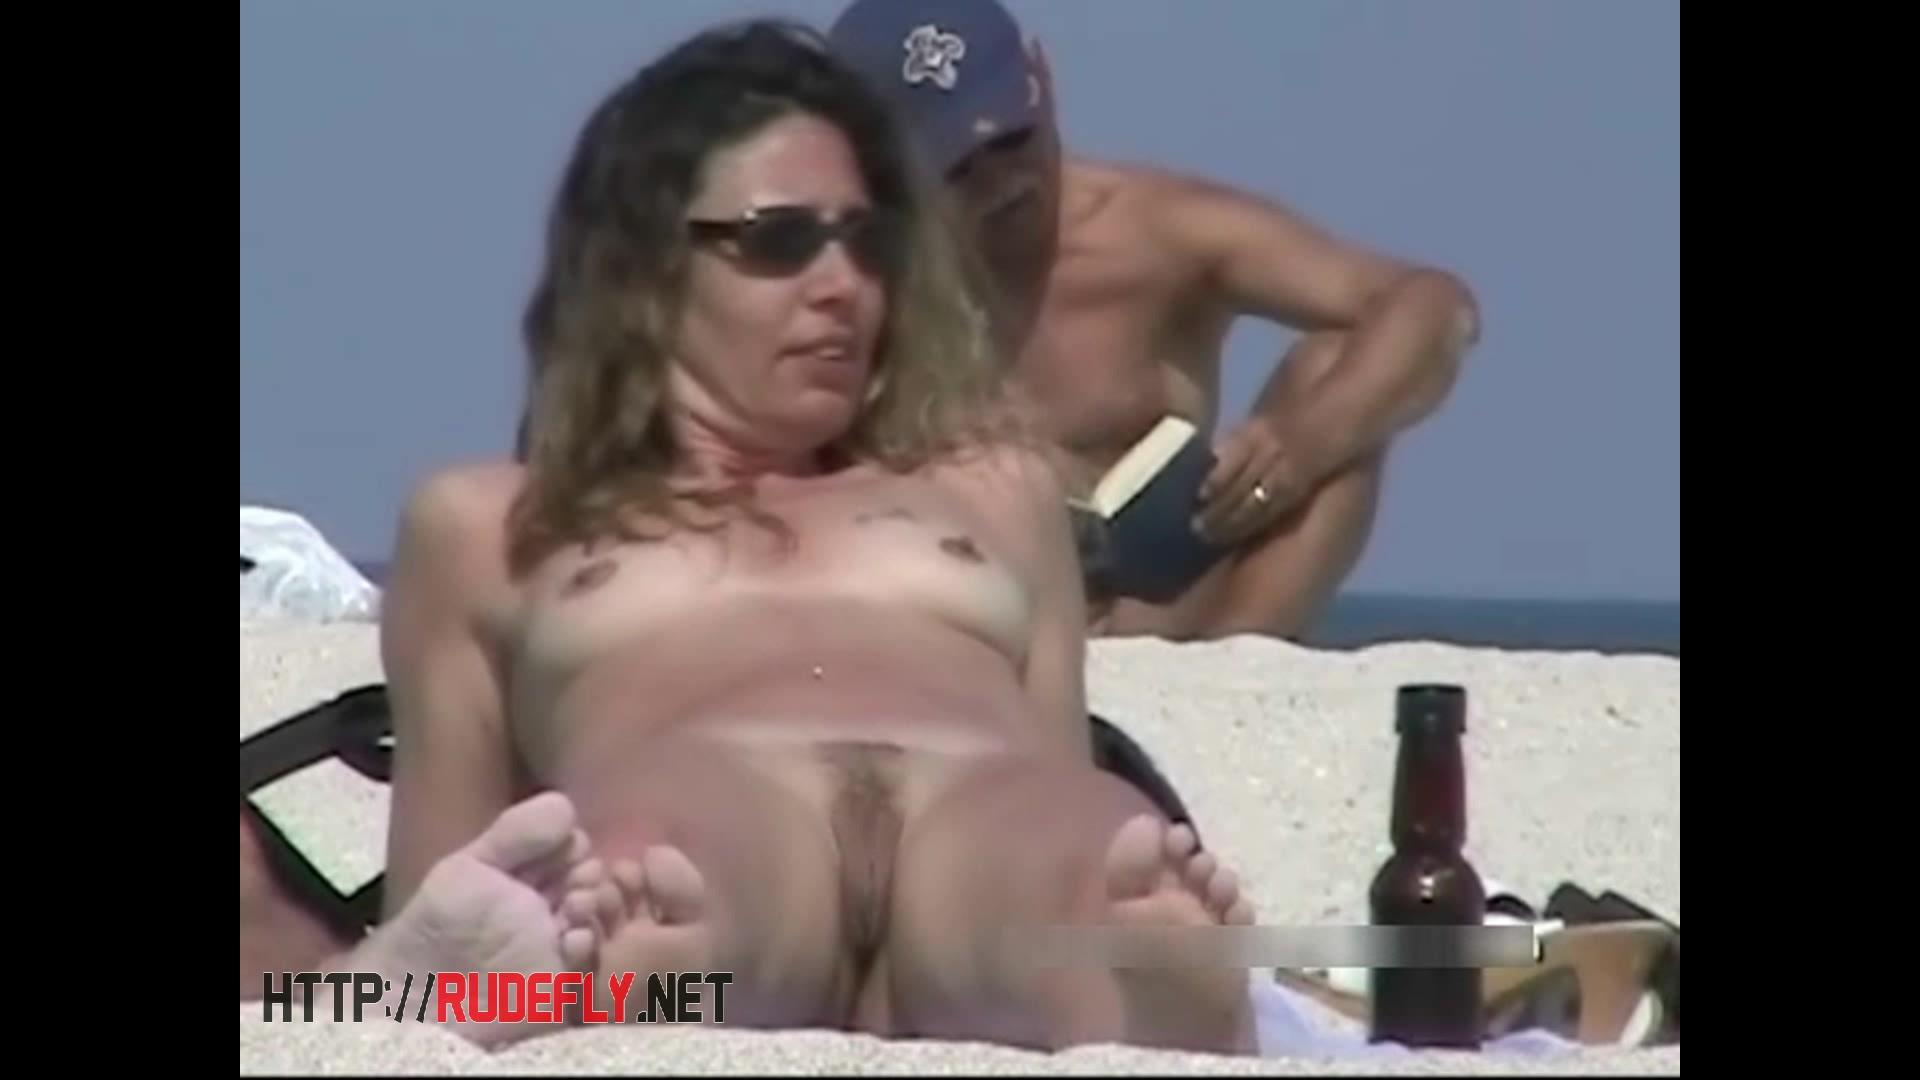 Splendid nude beach voyeur spy cam video 2